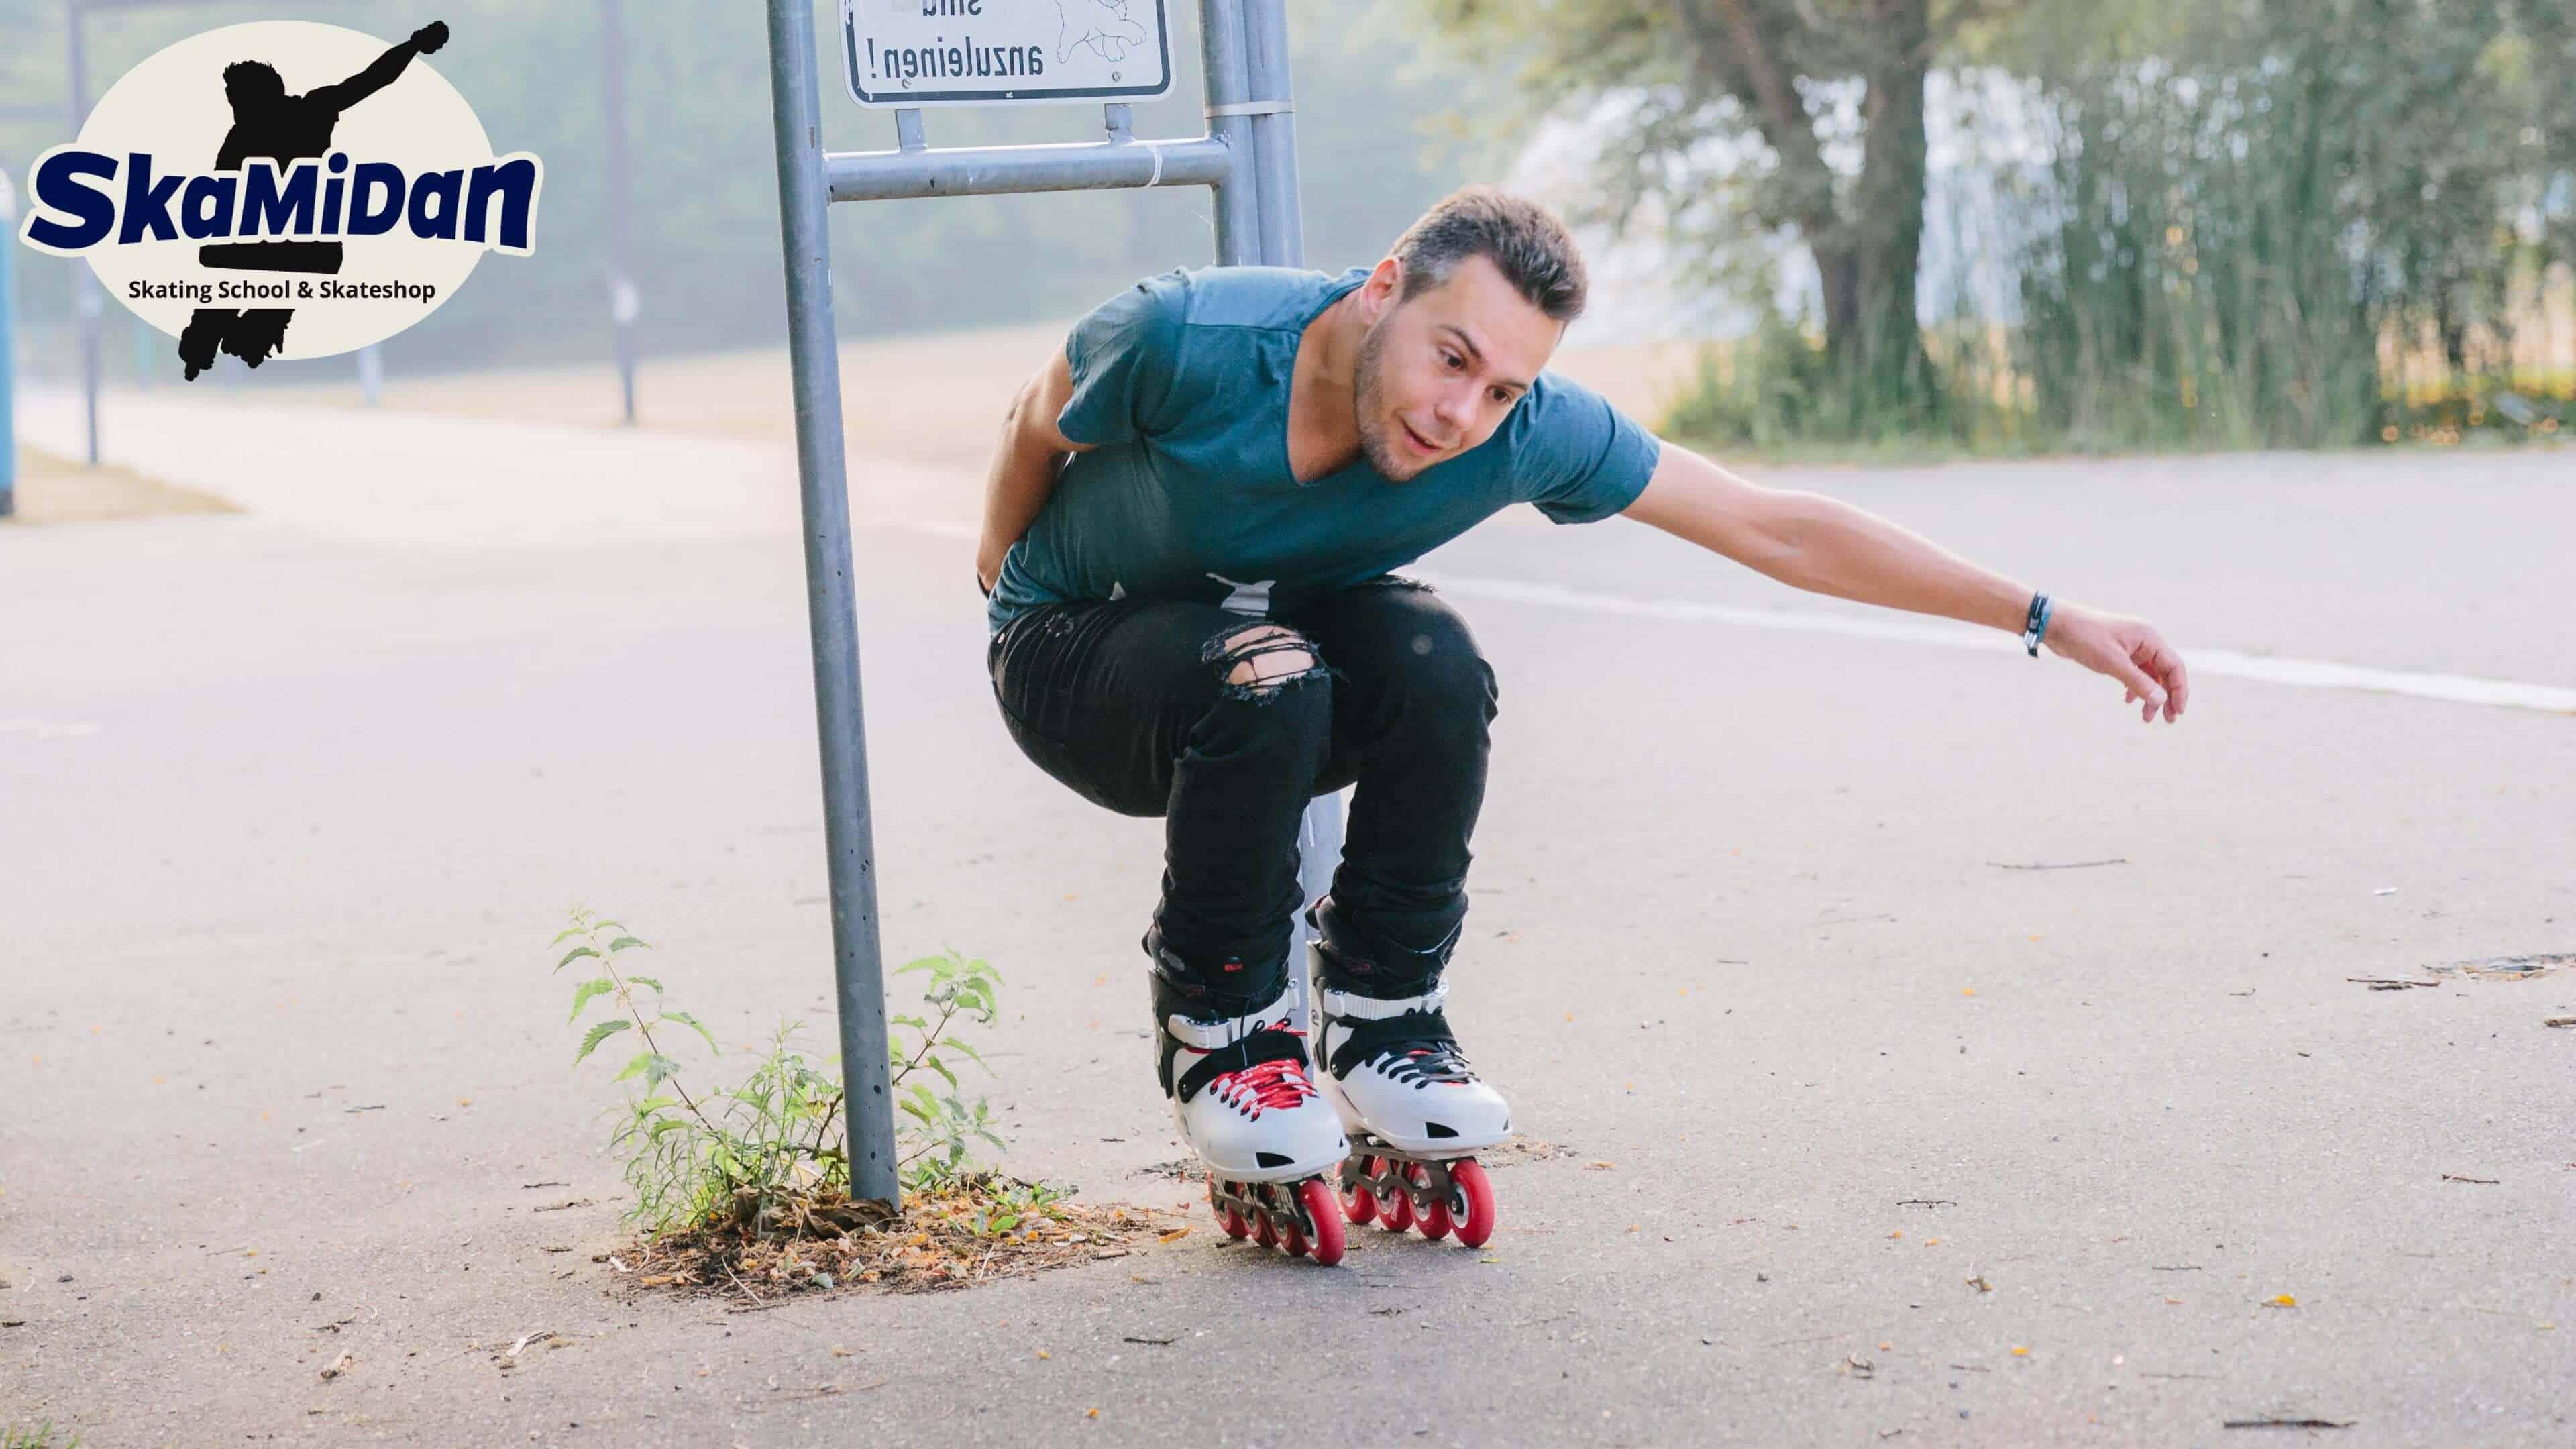 Social Media SkaMiDan Skateschule SkaMiDan Weil am Rhein Basel Lörrach und Region